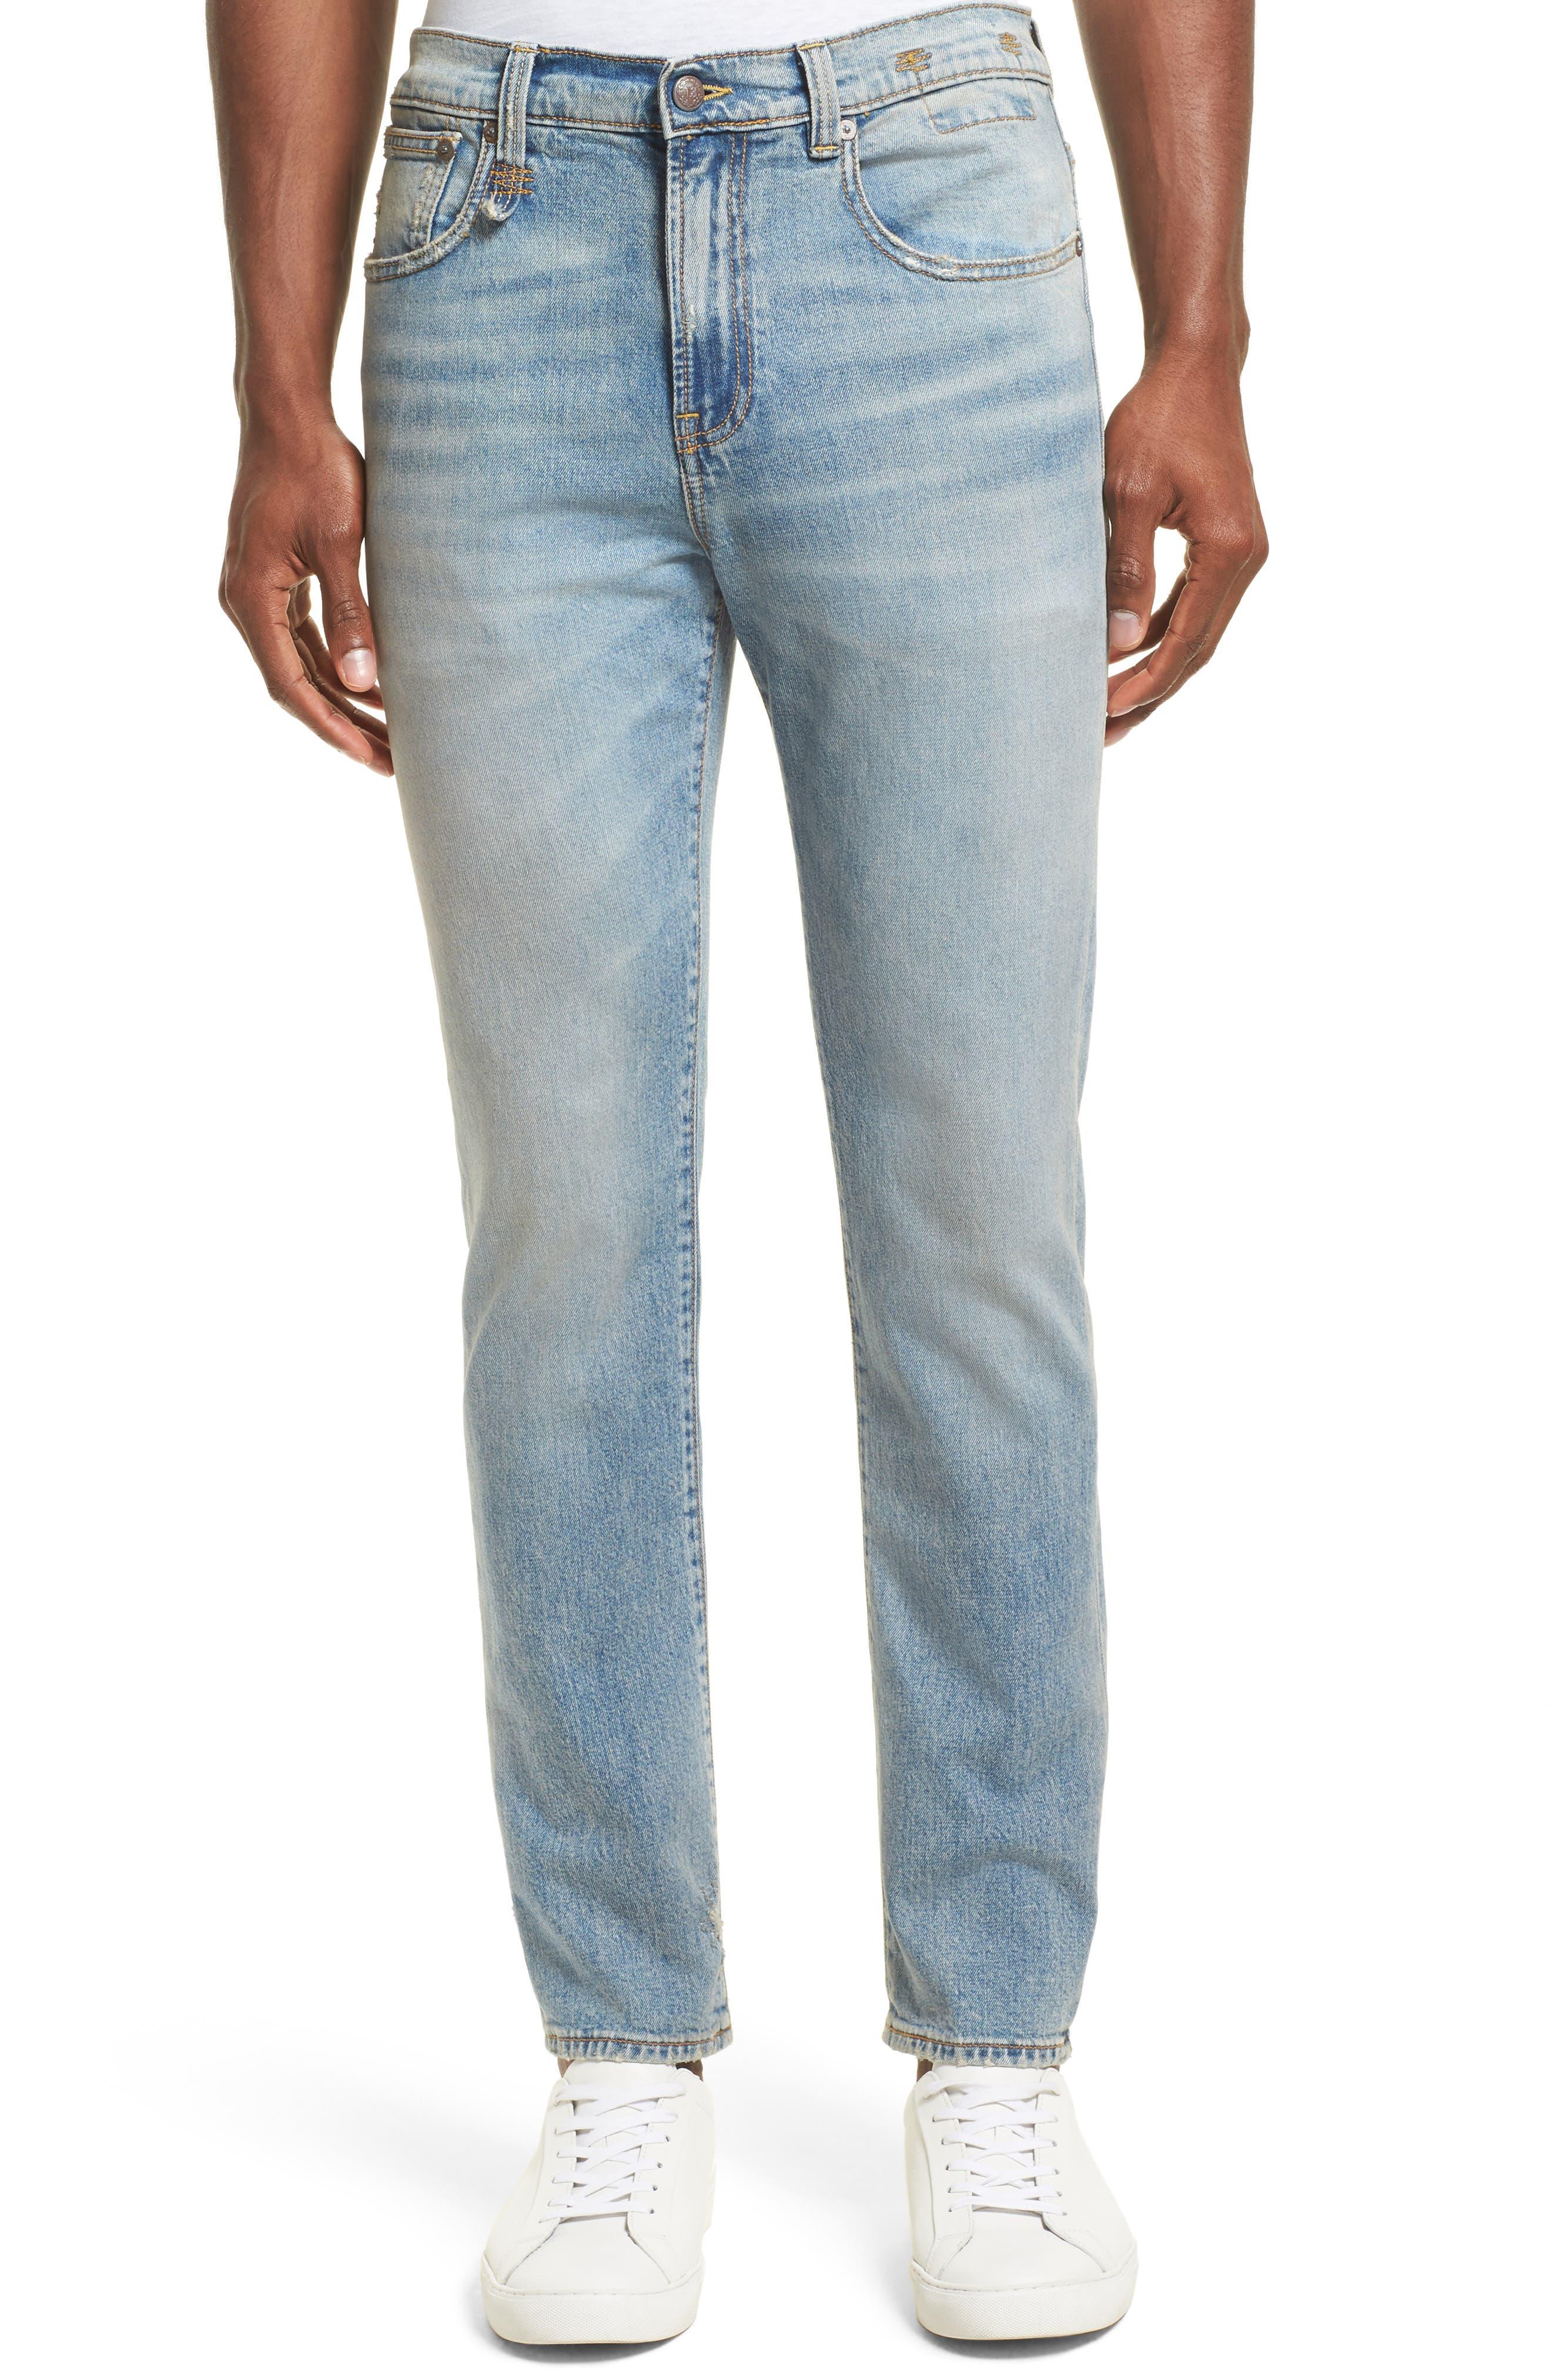 Boy Clean Jeans,                             Main thumbnail 1, color,                             LEYTON